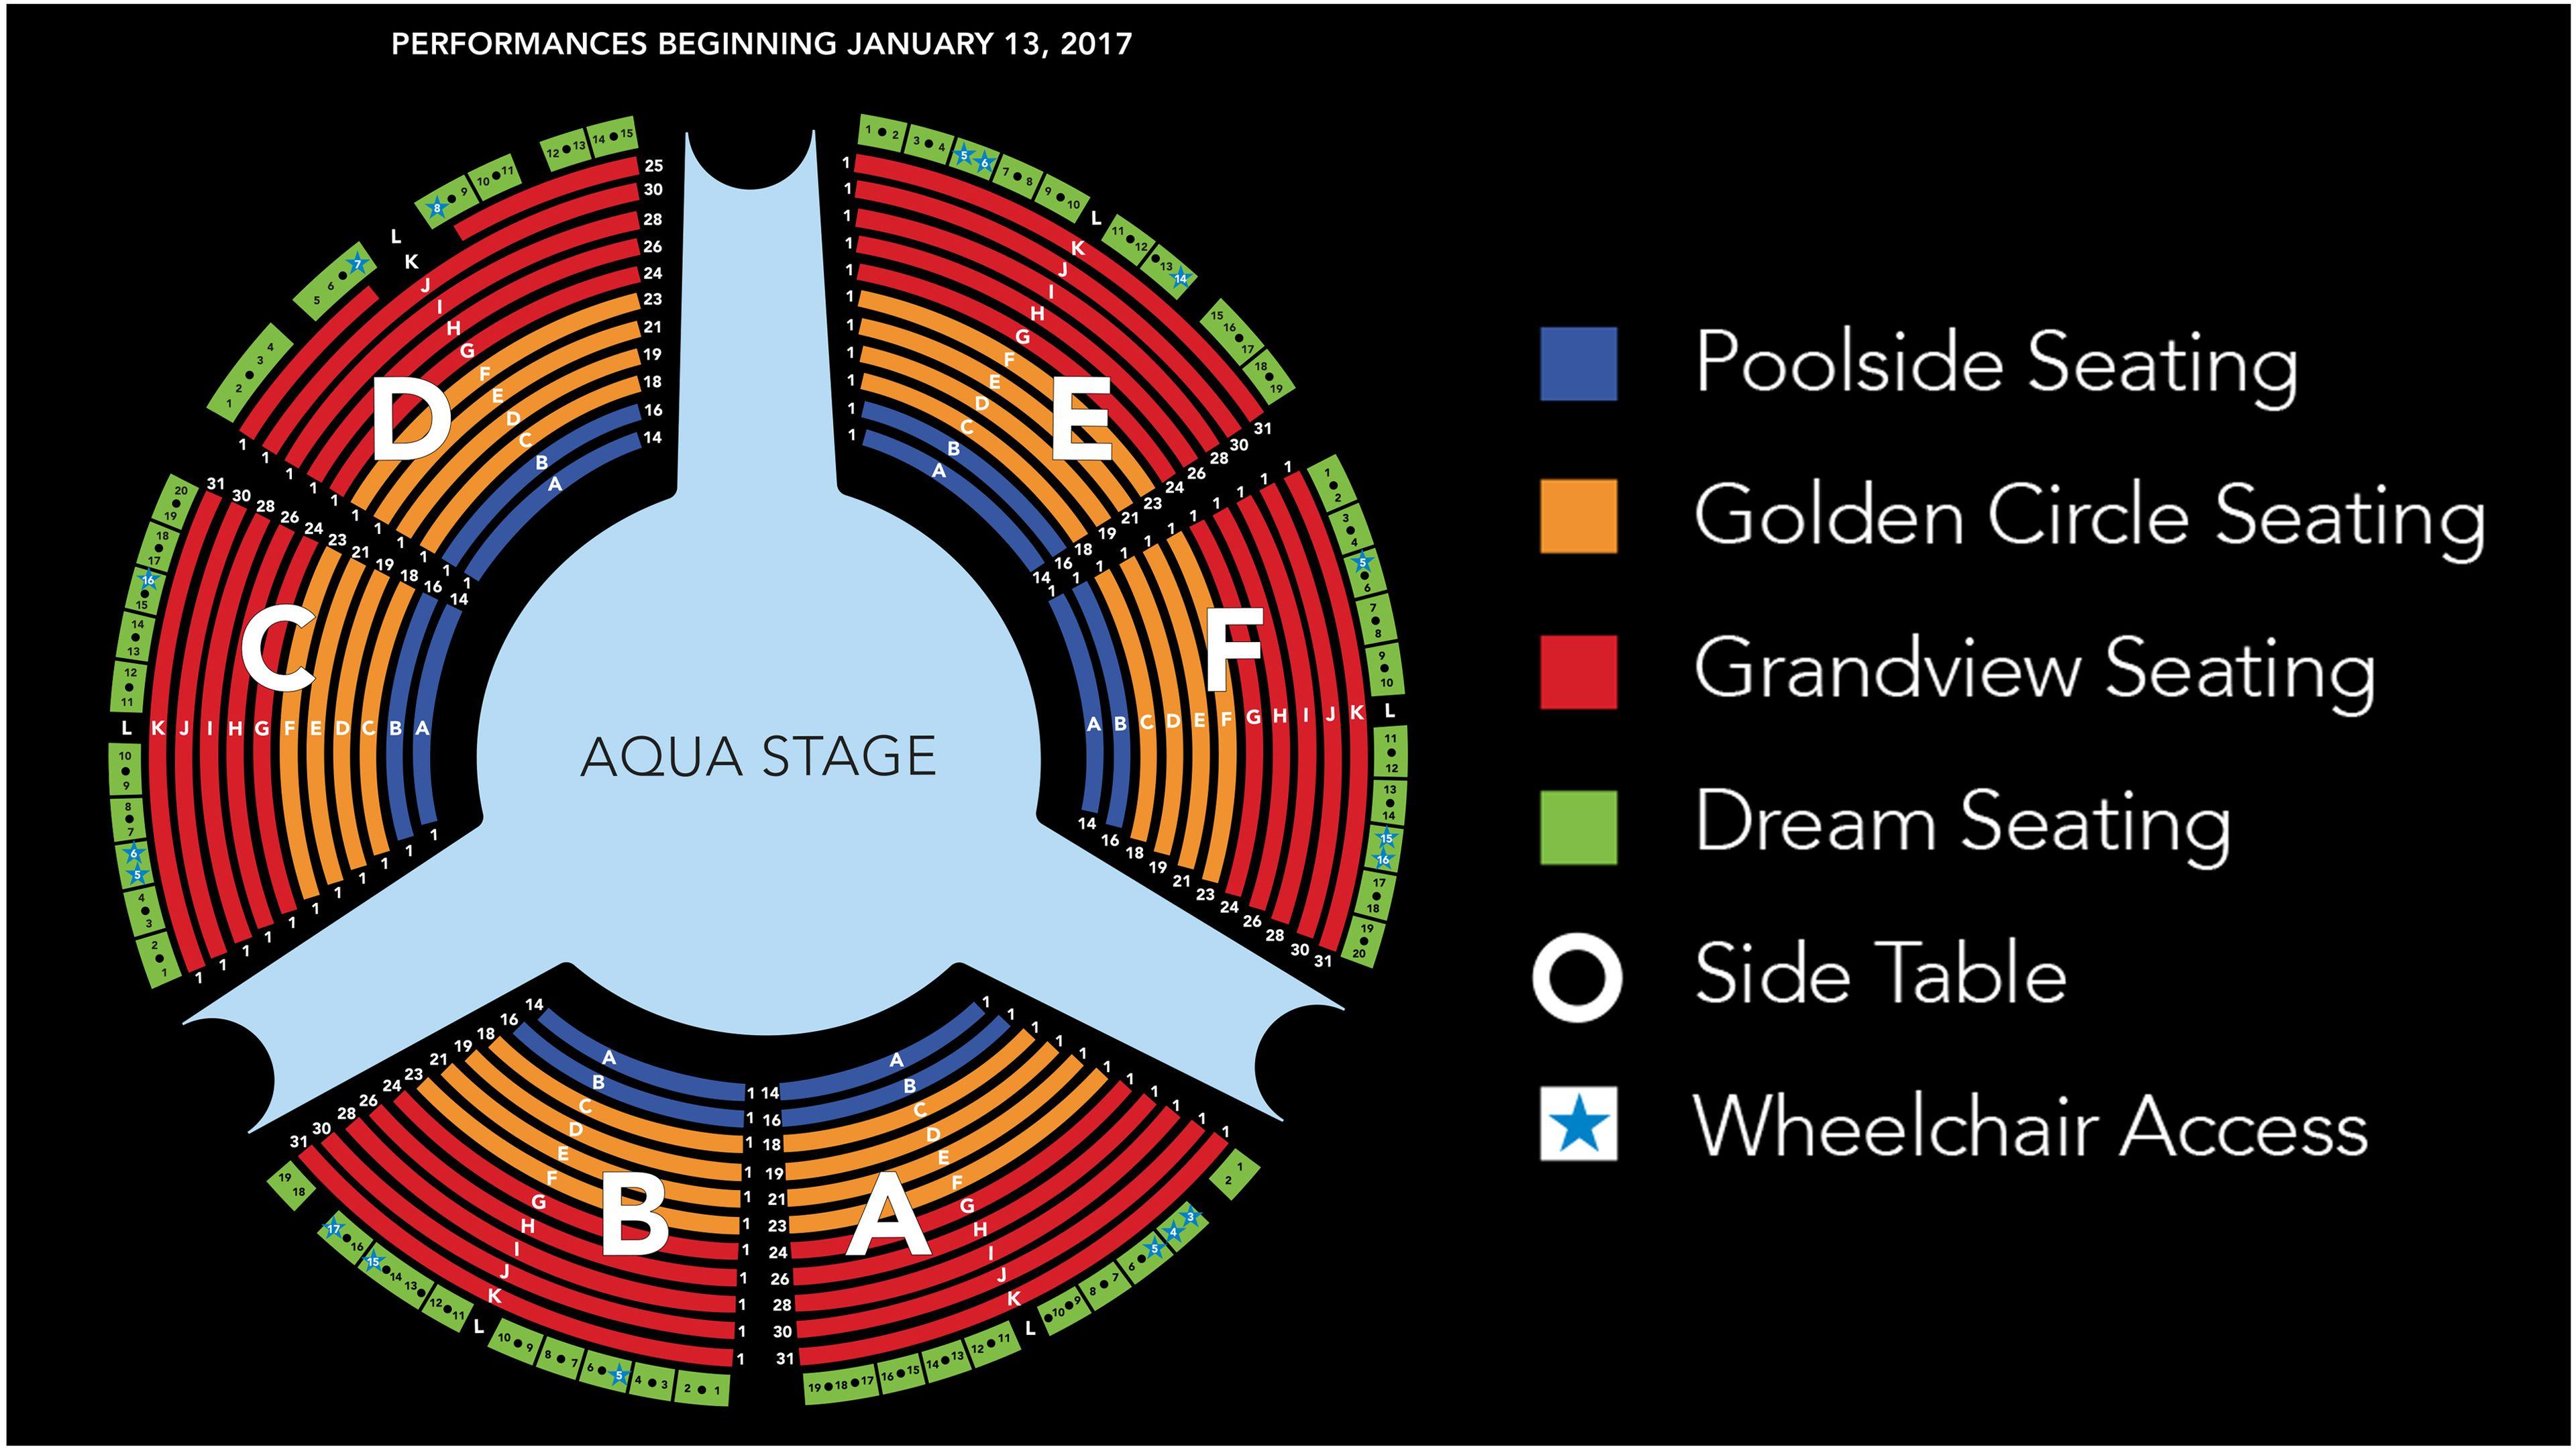 Aqua stage seating at Wynn Las Vegas